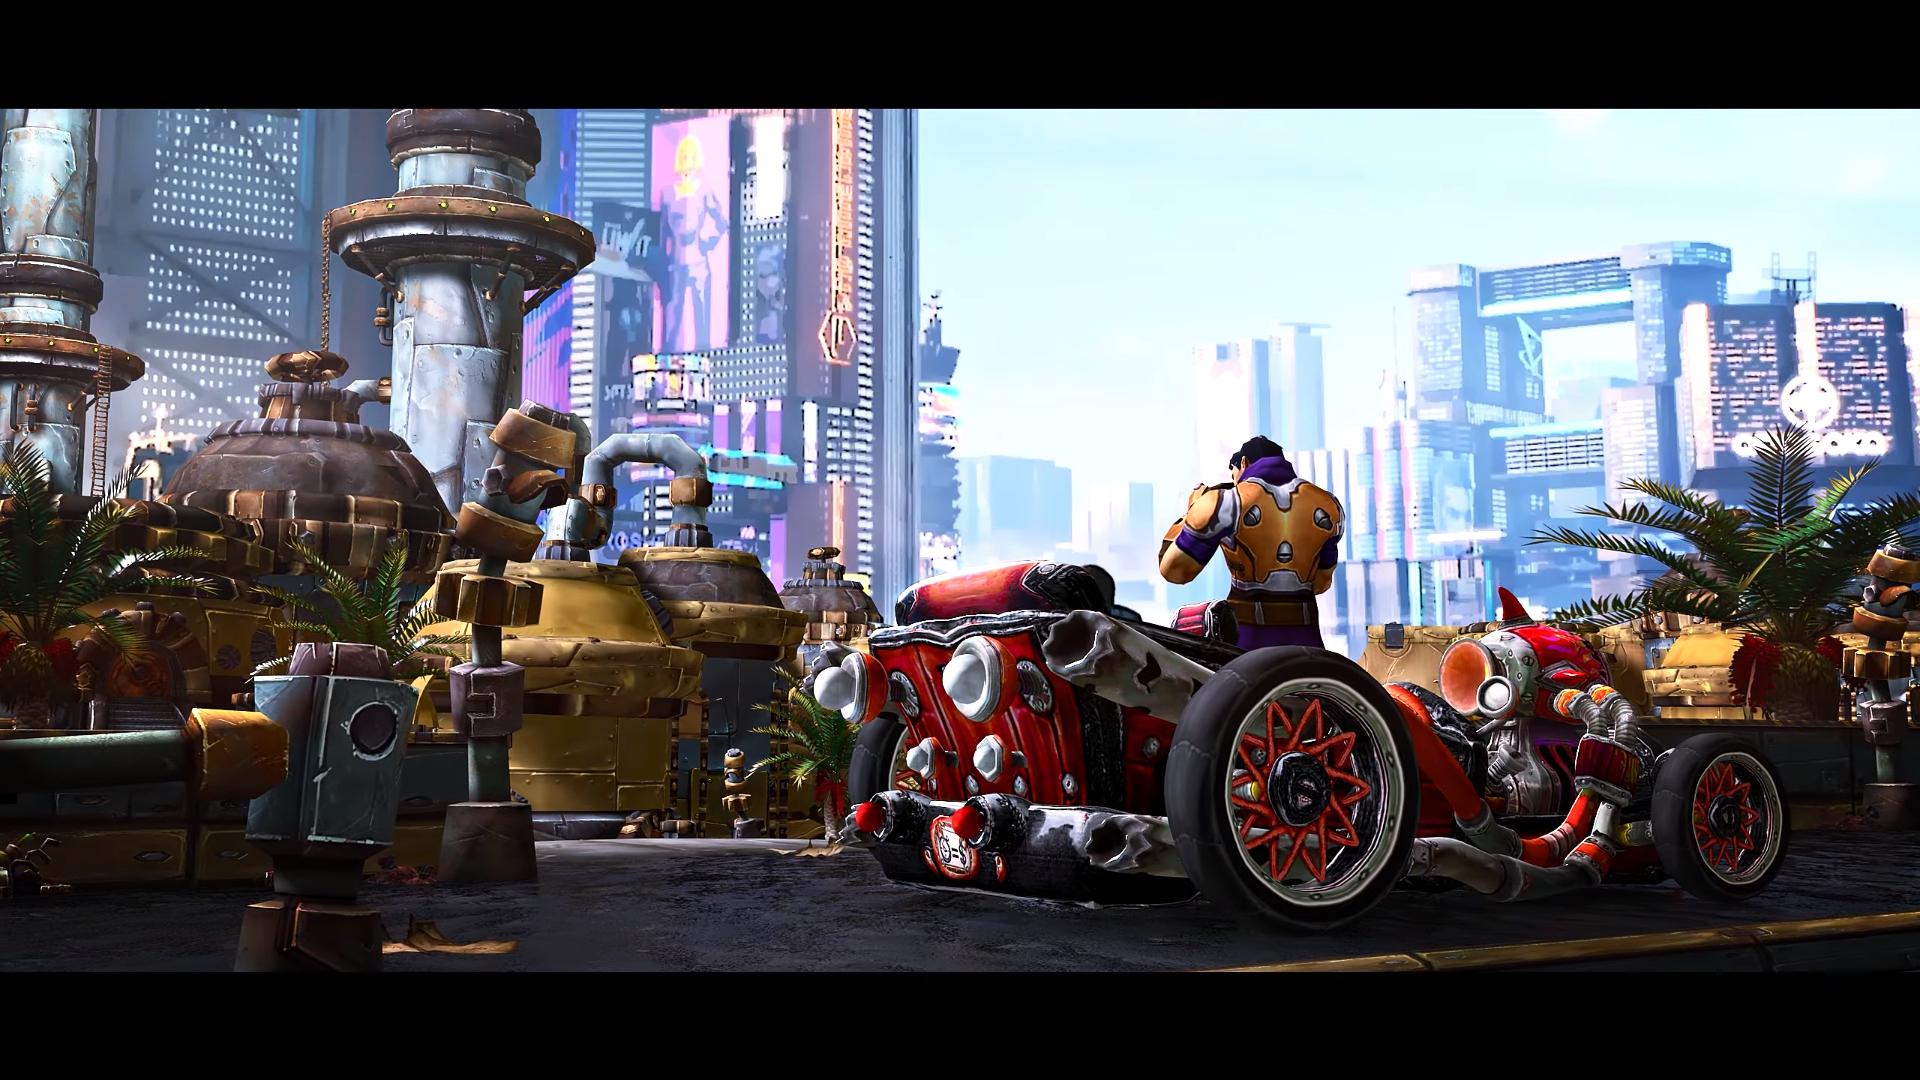 Трейлер Cyberpunk 2077 на движке World of Warcraft